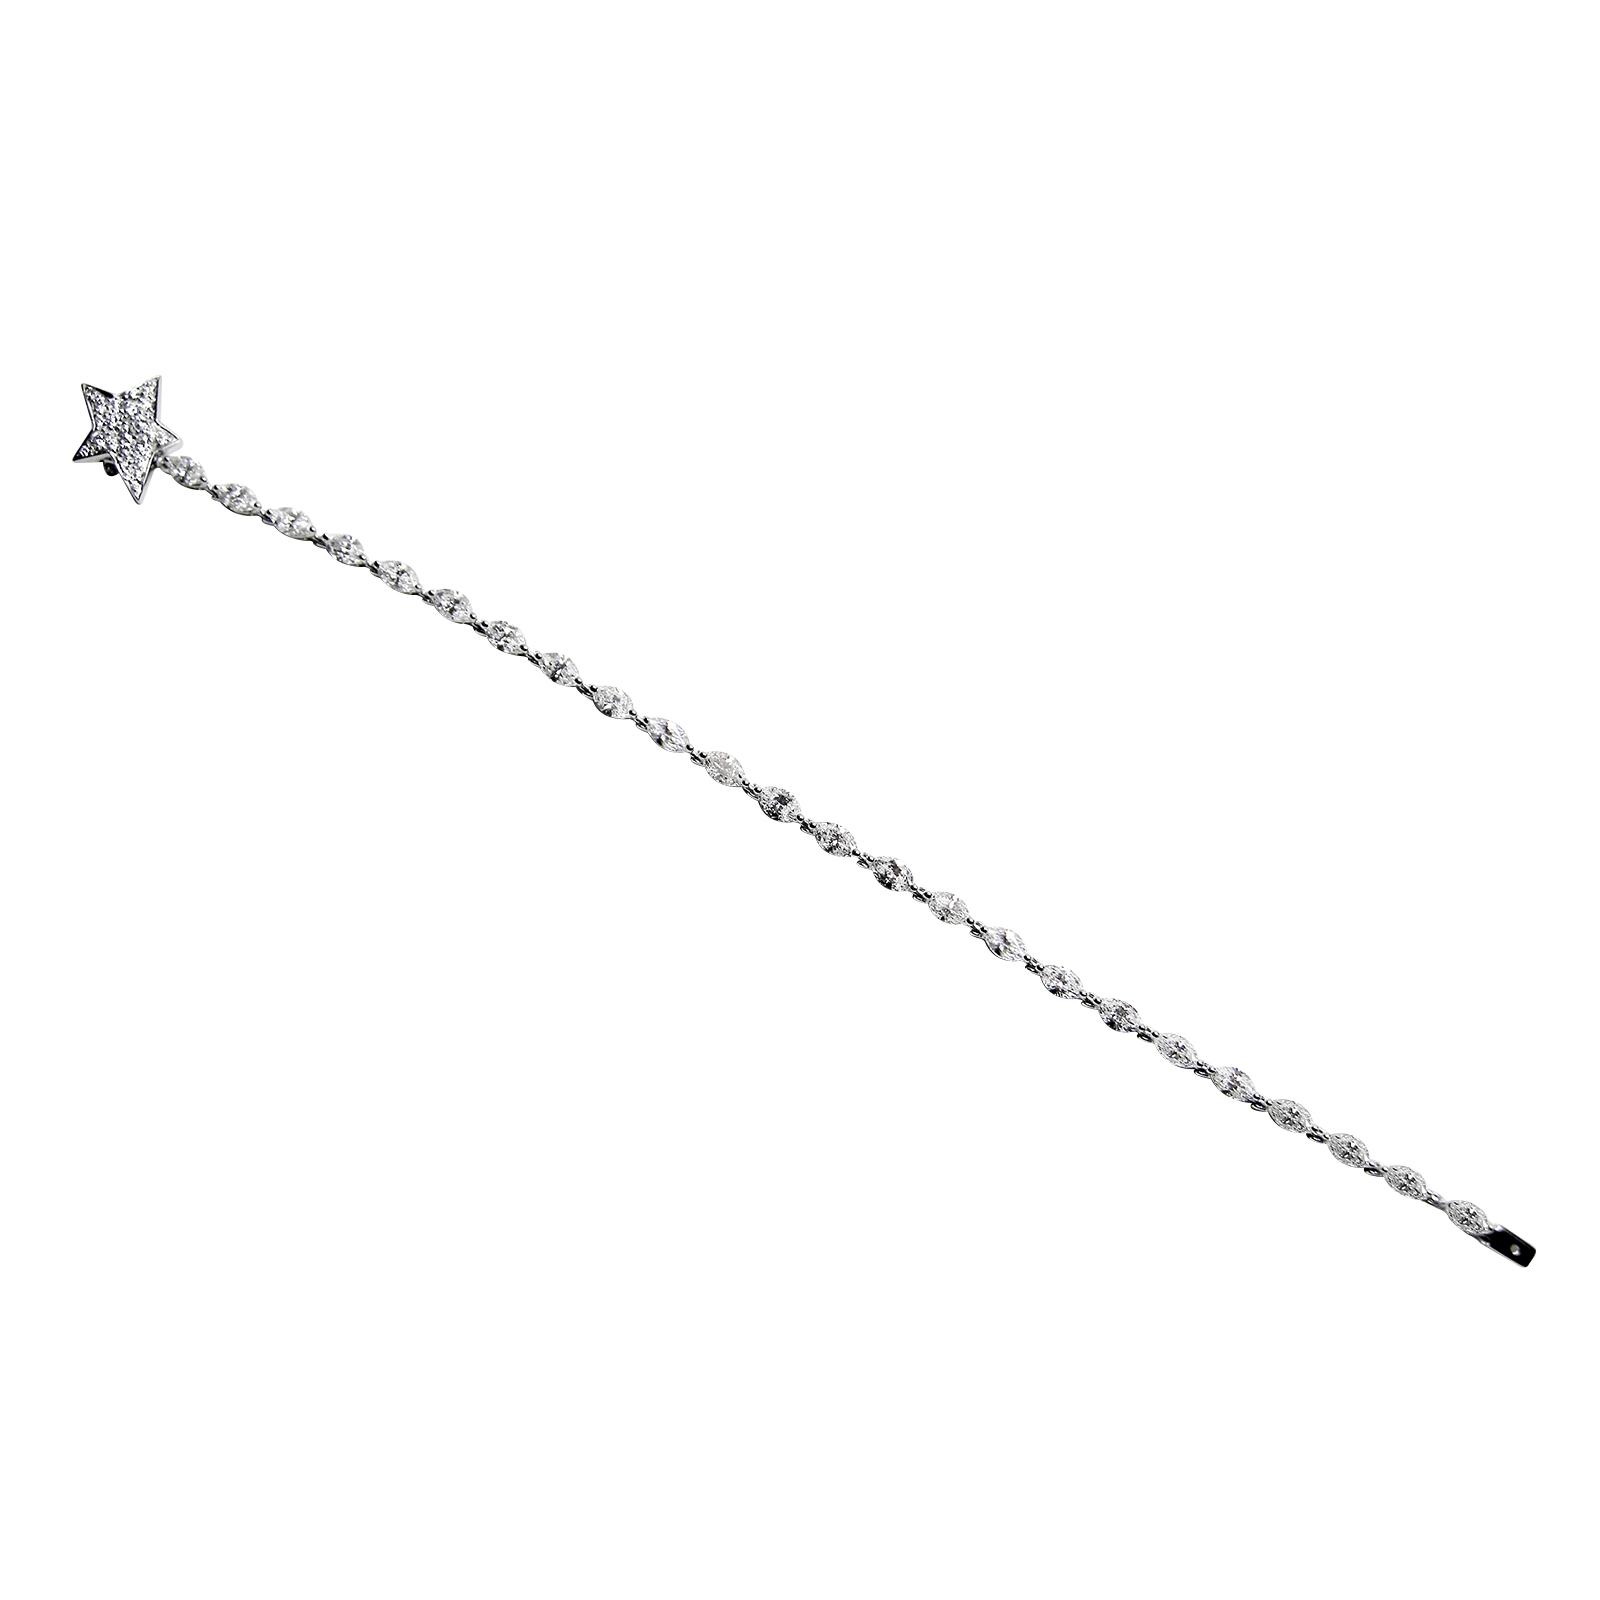 MARQUISE CUT DIAMOND TENNIS BRACELET CLUSTER DIAMOND PENDANT BESPOKE FINE JEWELLERY BY SHAHINA HATTA